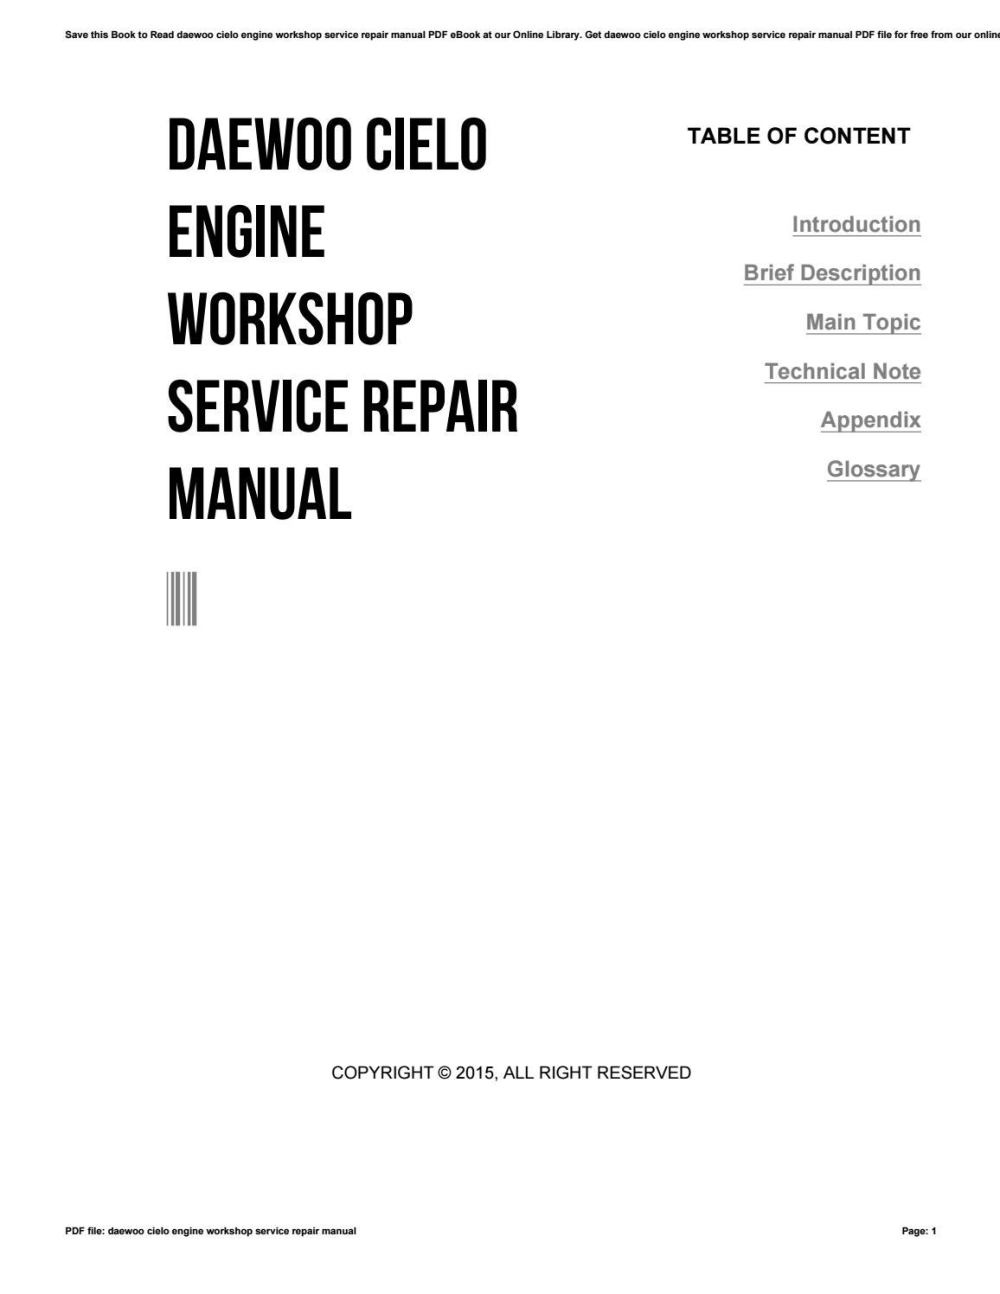 medium resolution of daewoo cielo workshop manual free download wiring library rh 1 yoobi de daewoo cielo workshop manual